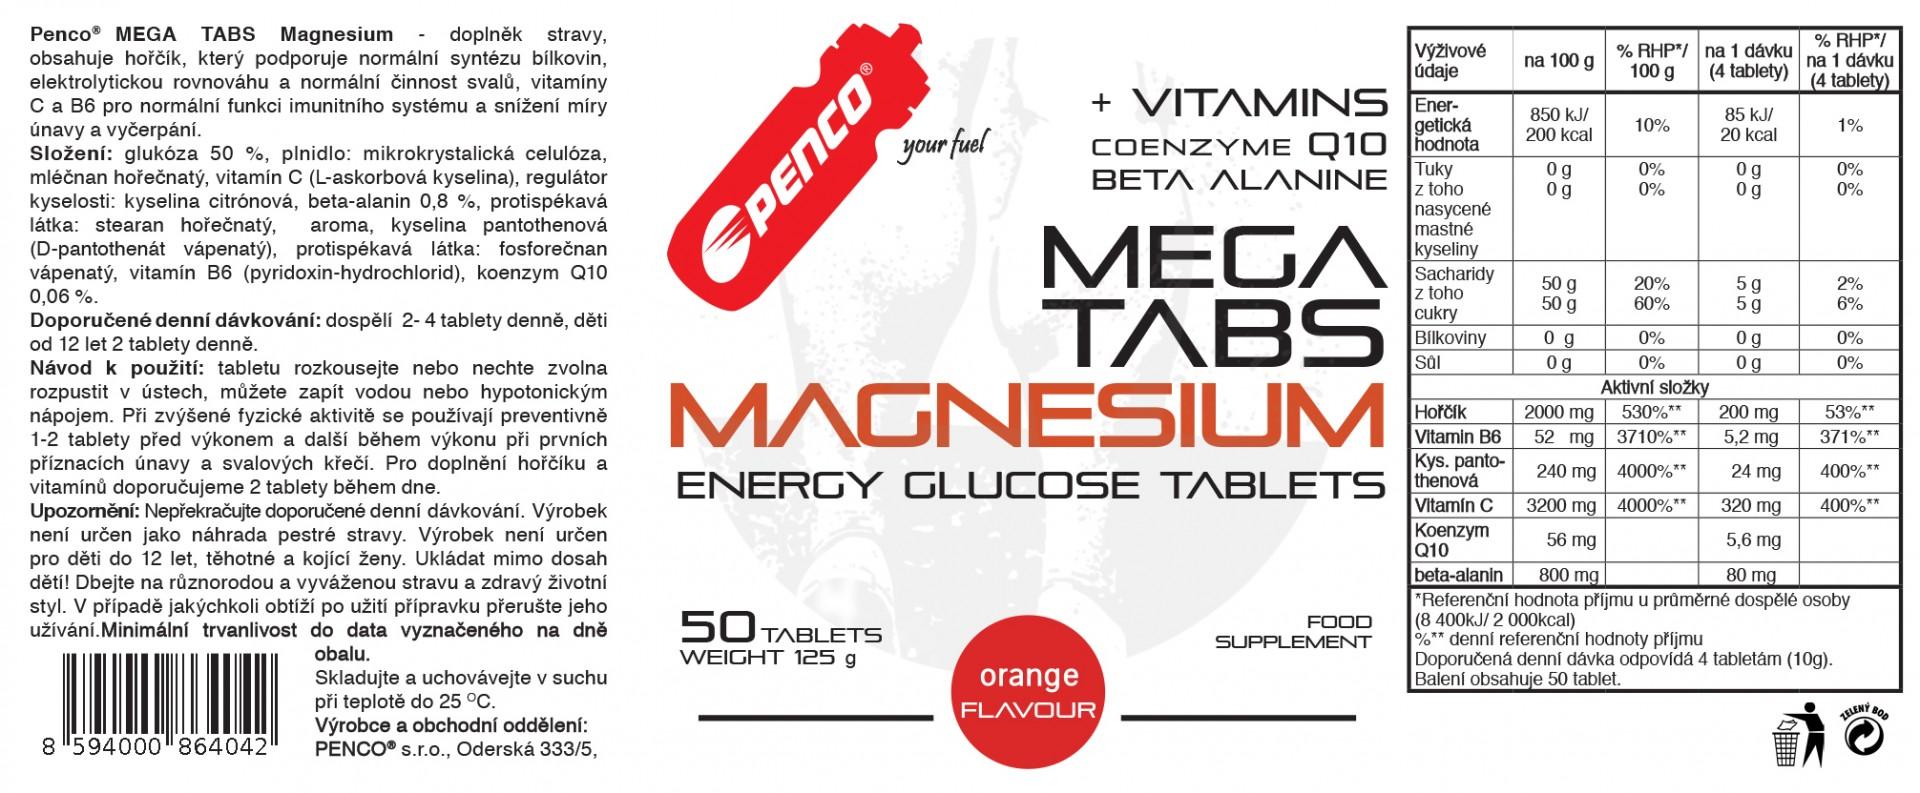 Hořčíkové tablety  MEGA TABS MAGNESIUM  50 cucavých tablet č.2